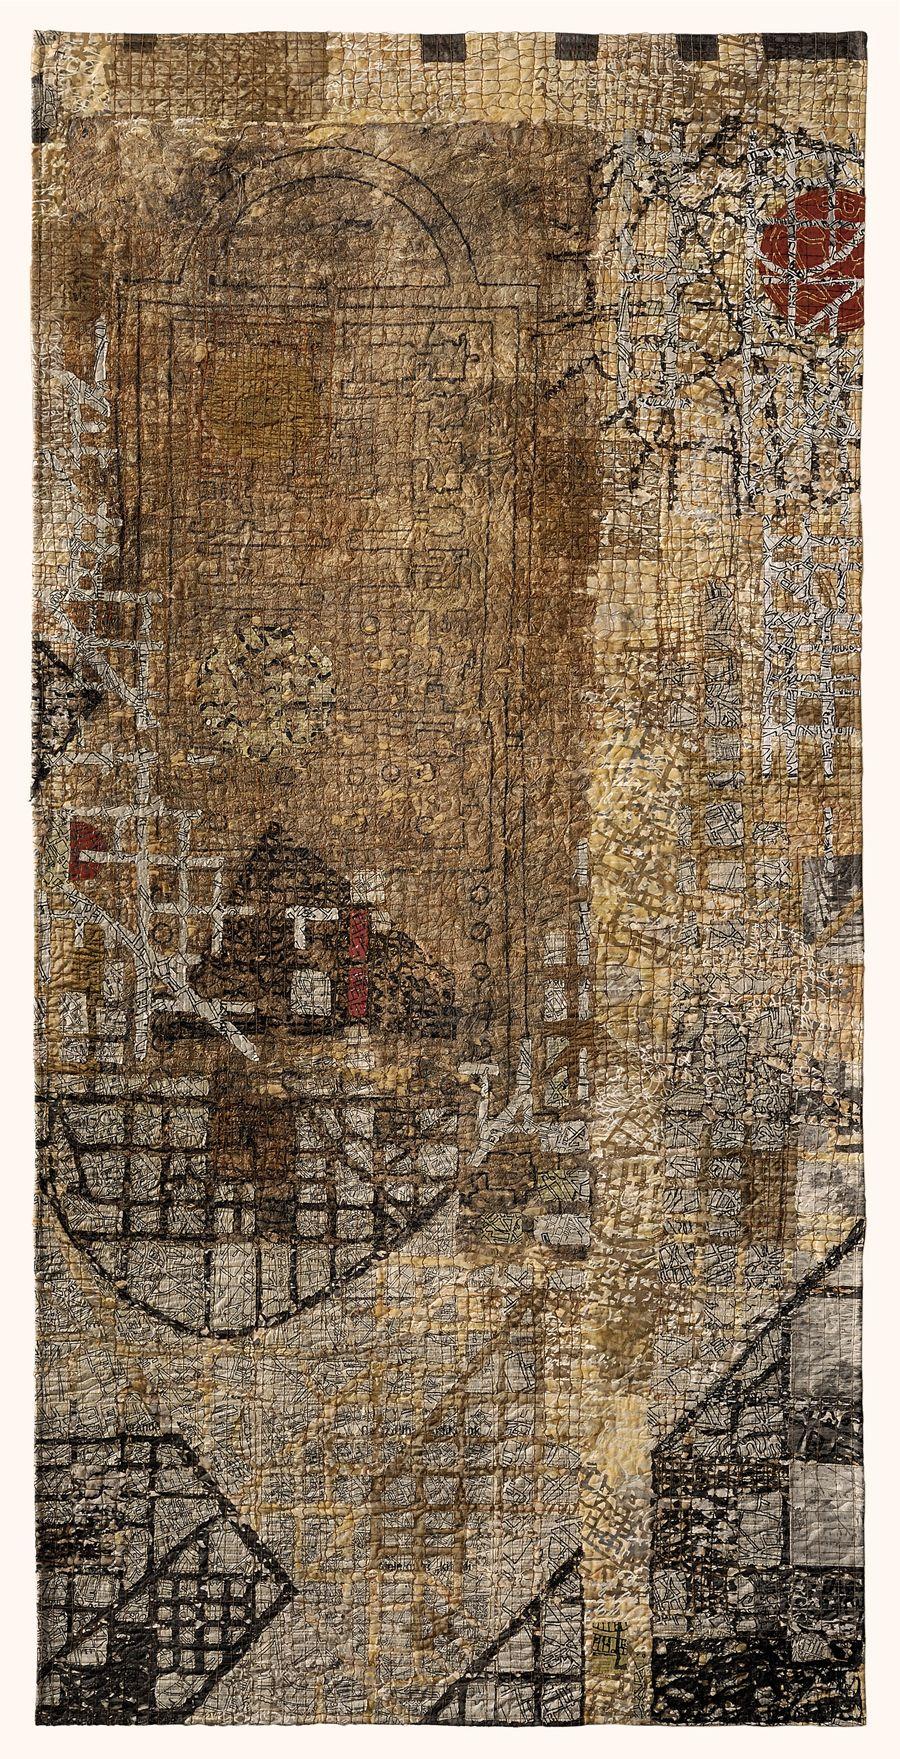 Spirit Of The Times Eszter Bornemisza May 2014 Fabric